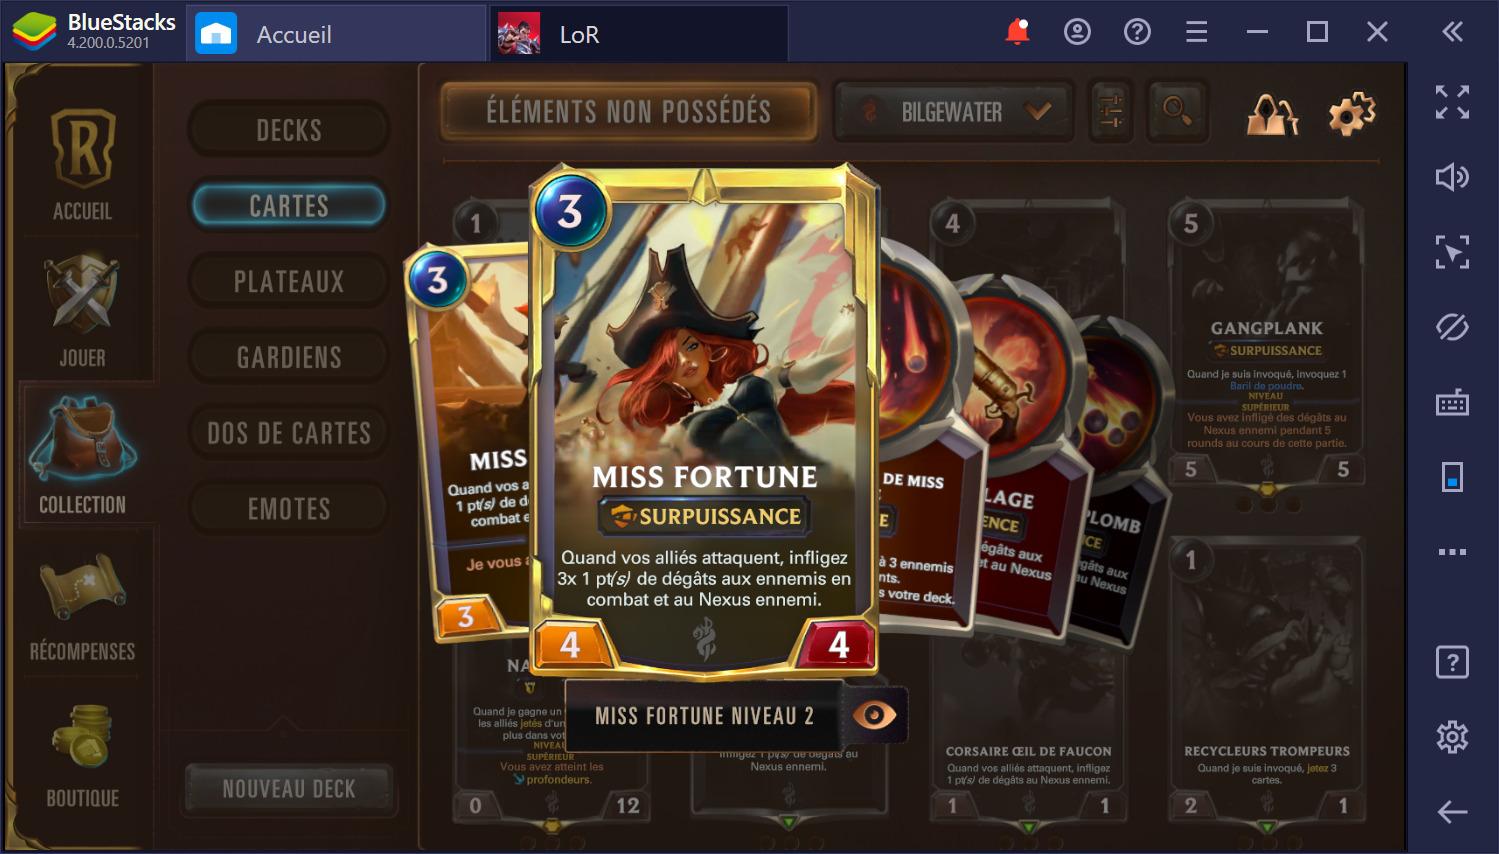 Les meilleurs champions de Legends of Runeterra (avril 2020)